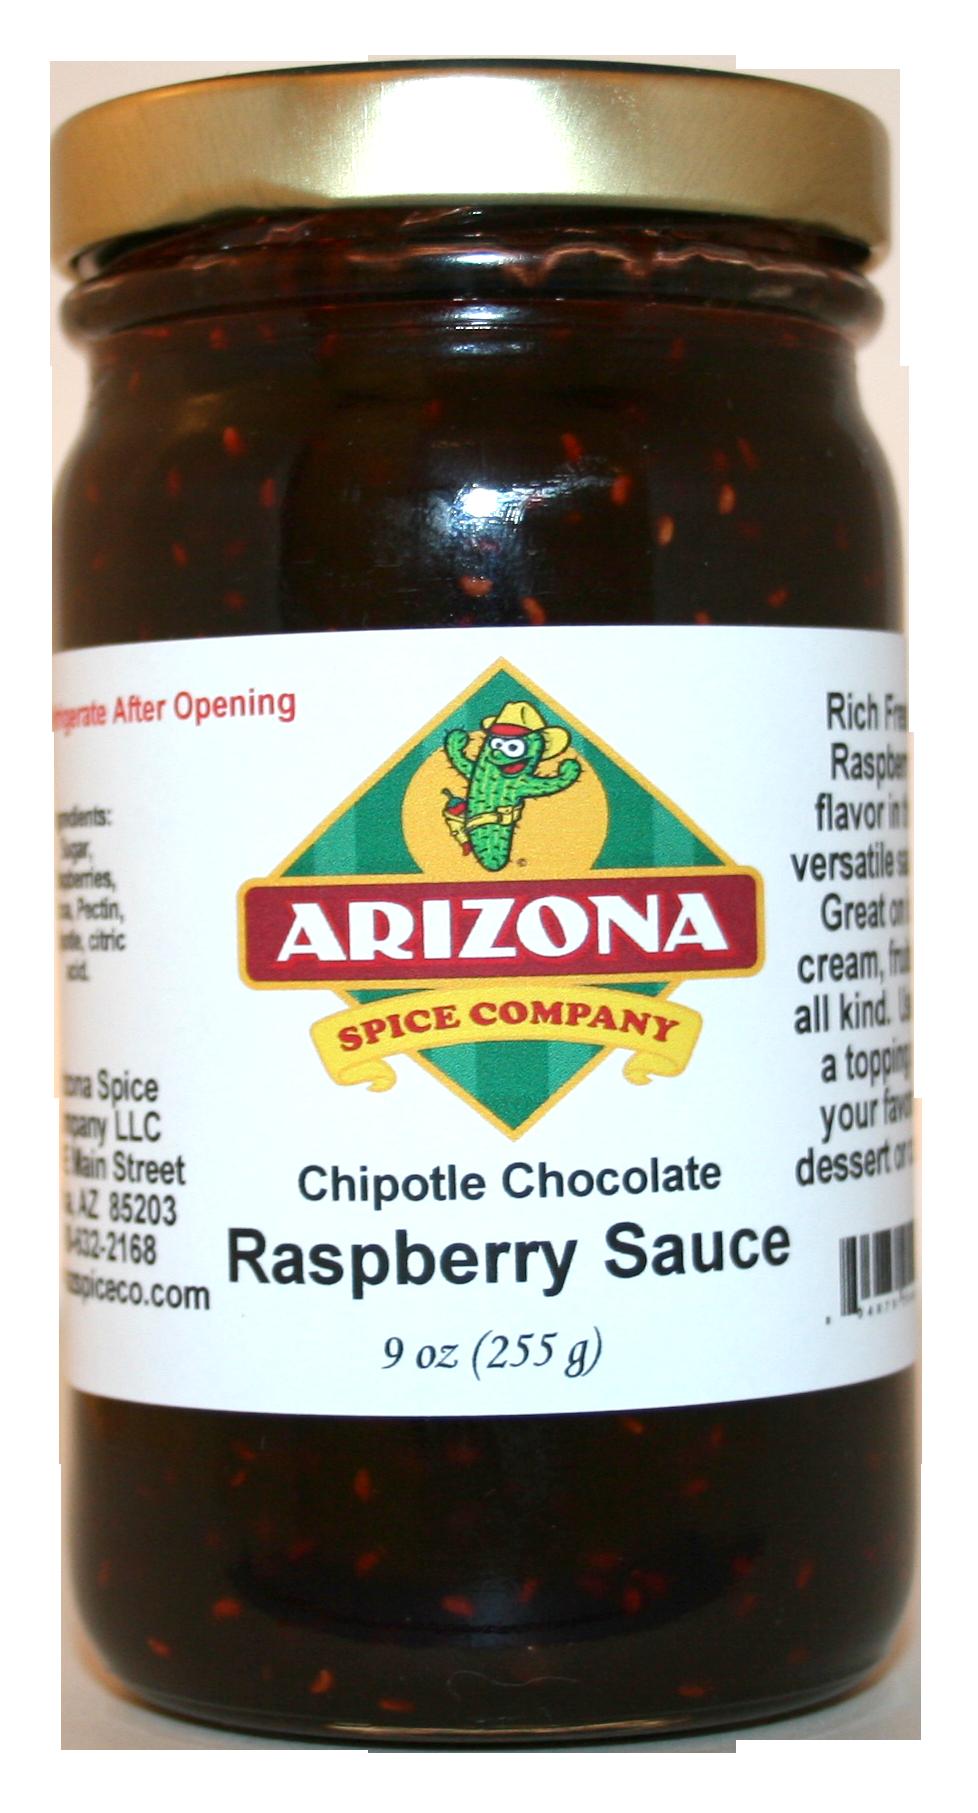 Arizona Salsa and Spice Co image 26